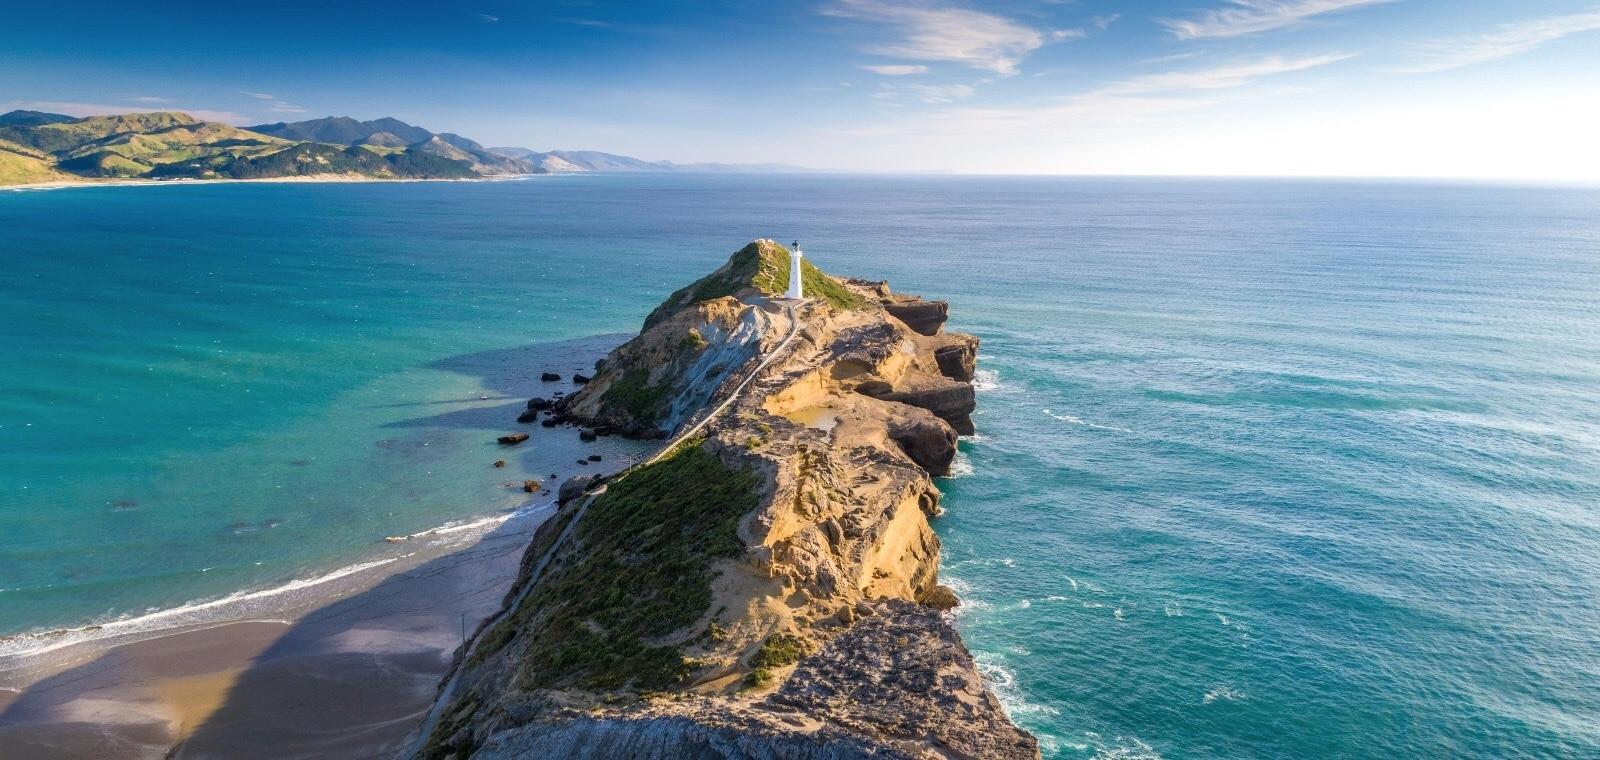 Castlepoint Beach, Castlepoint, Wellington Region, New Zealand